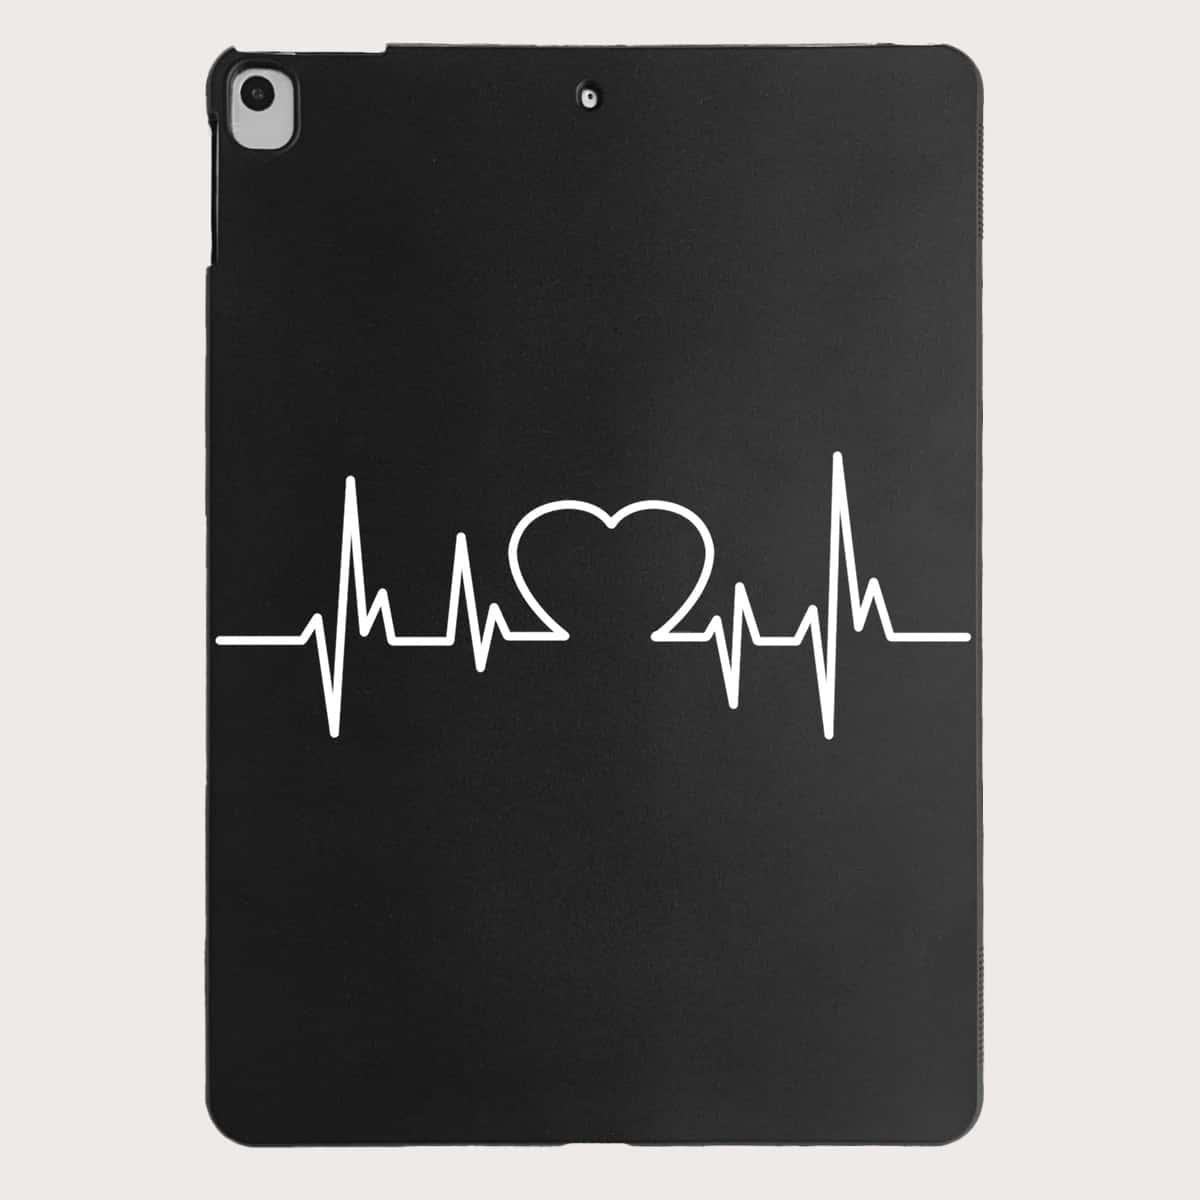 Чехол с рисунком электрокардиограммы для iPad